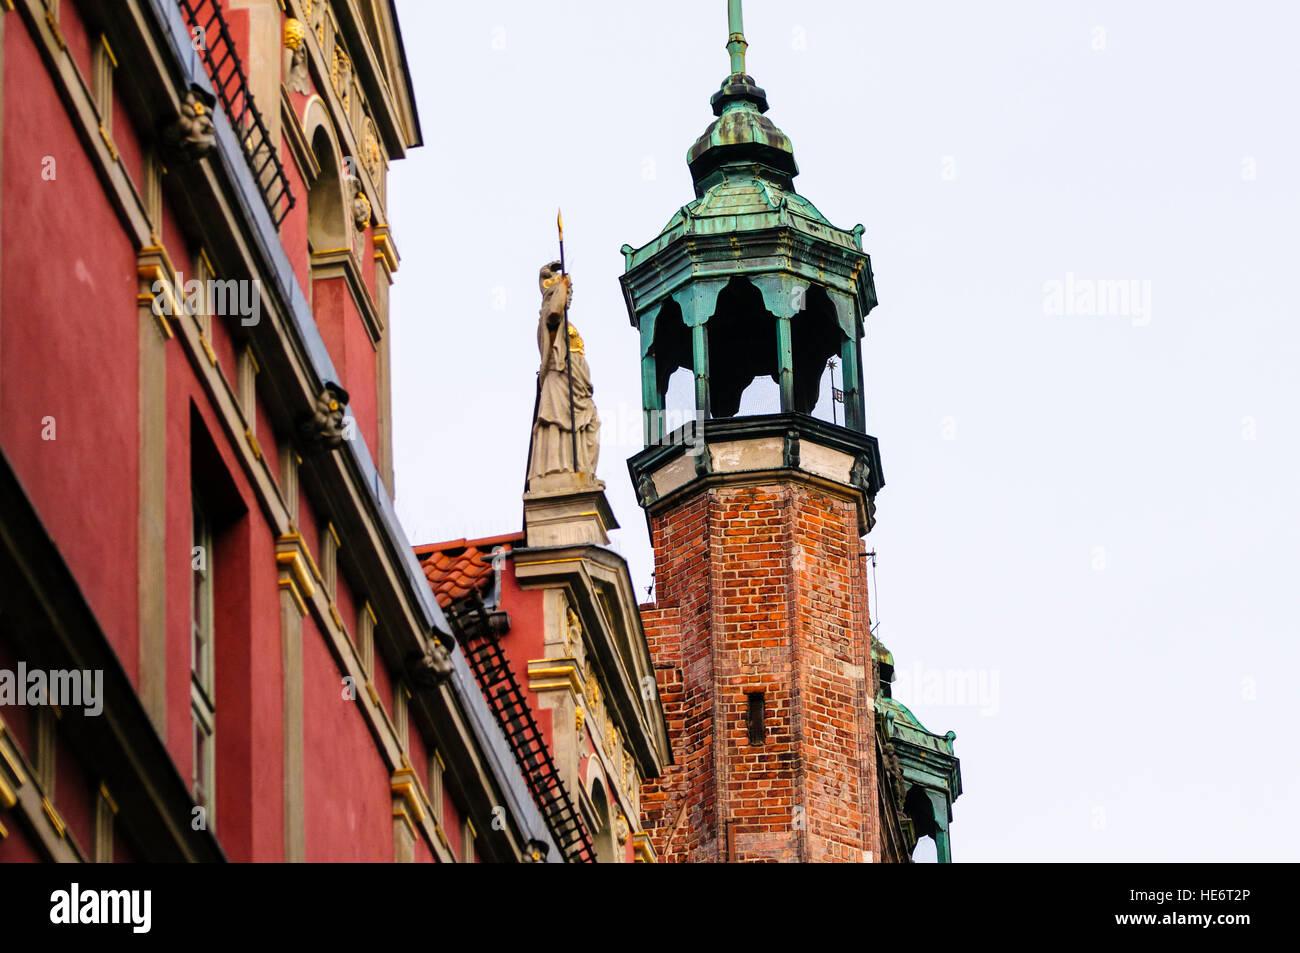 One of the minor spires of the Muzeum Historyczne Miasta Gdańska in Dluga, Dlugi Targ, Gdansk - Stock Image